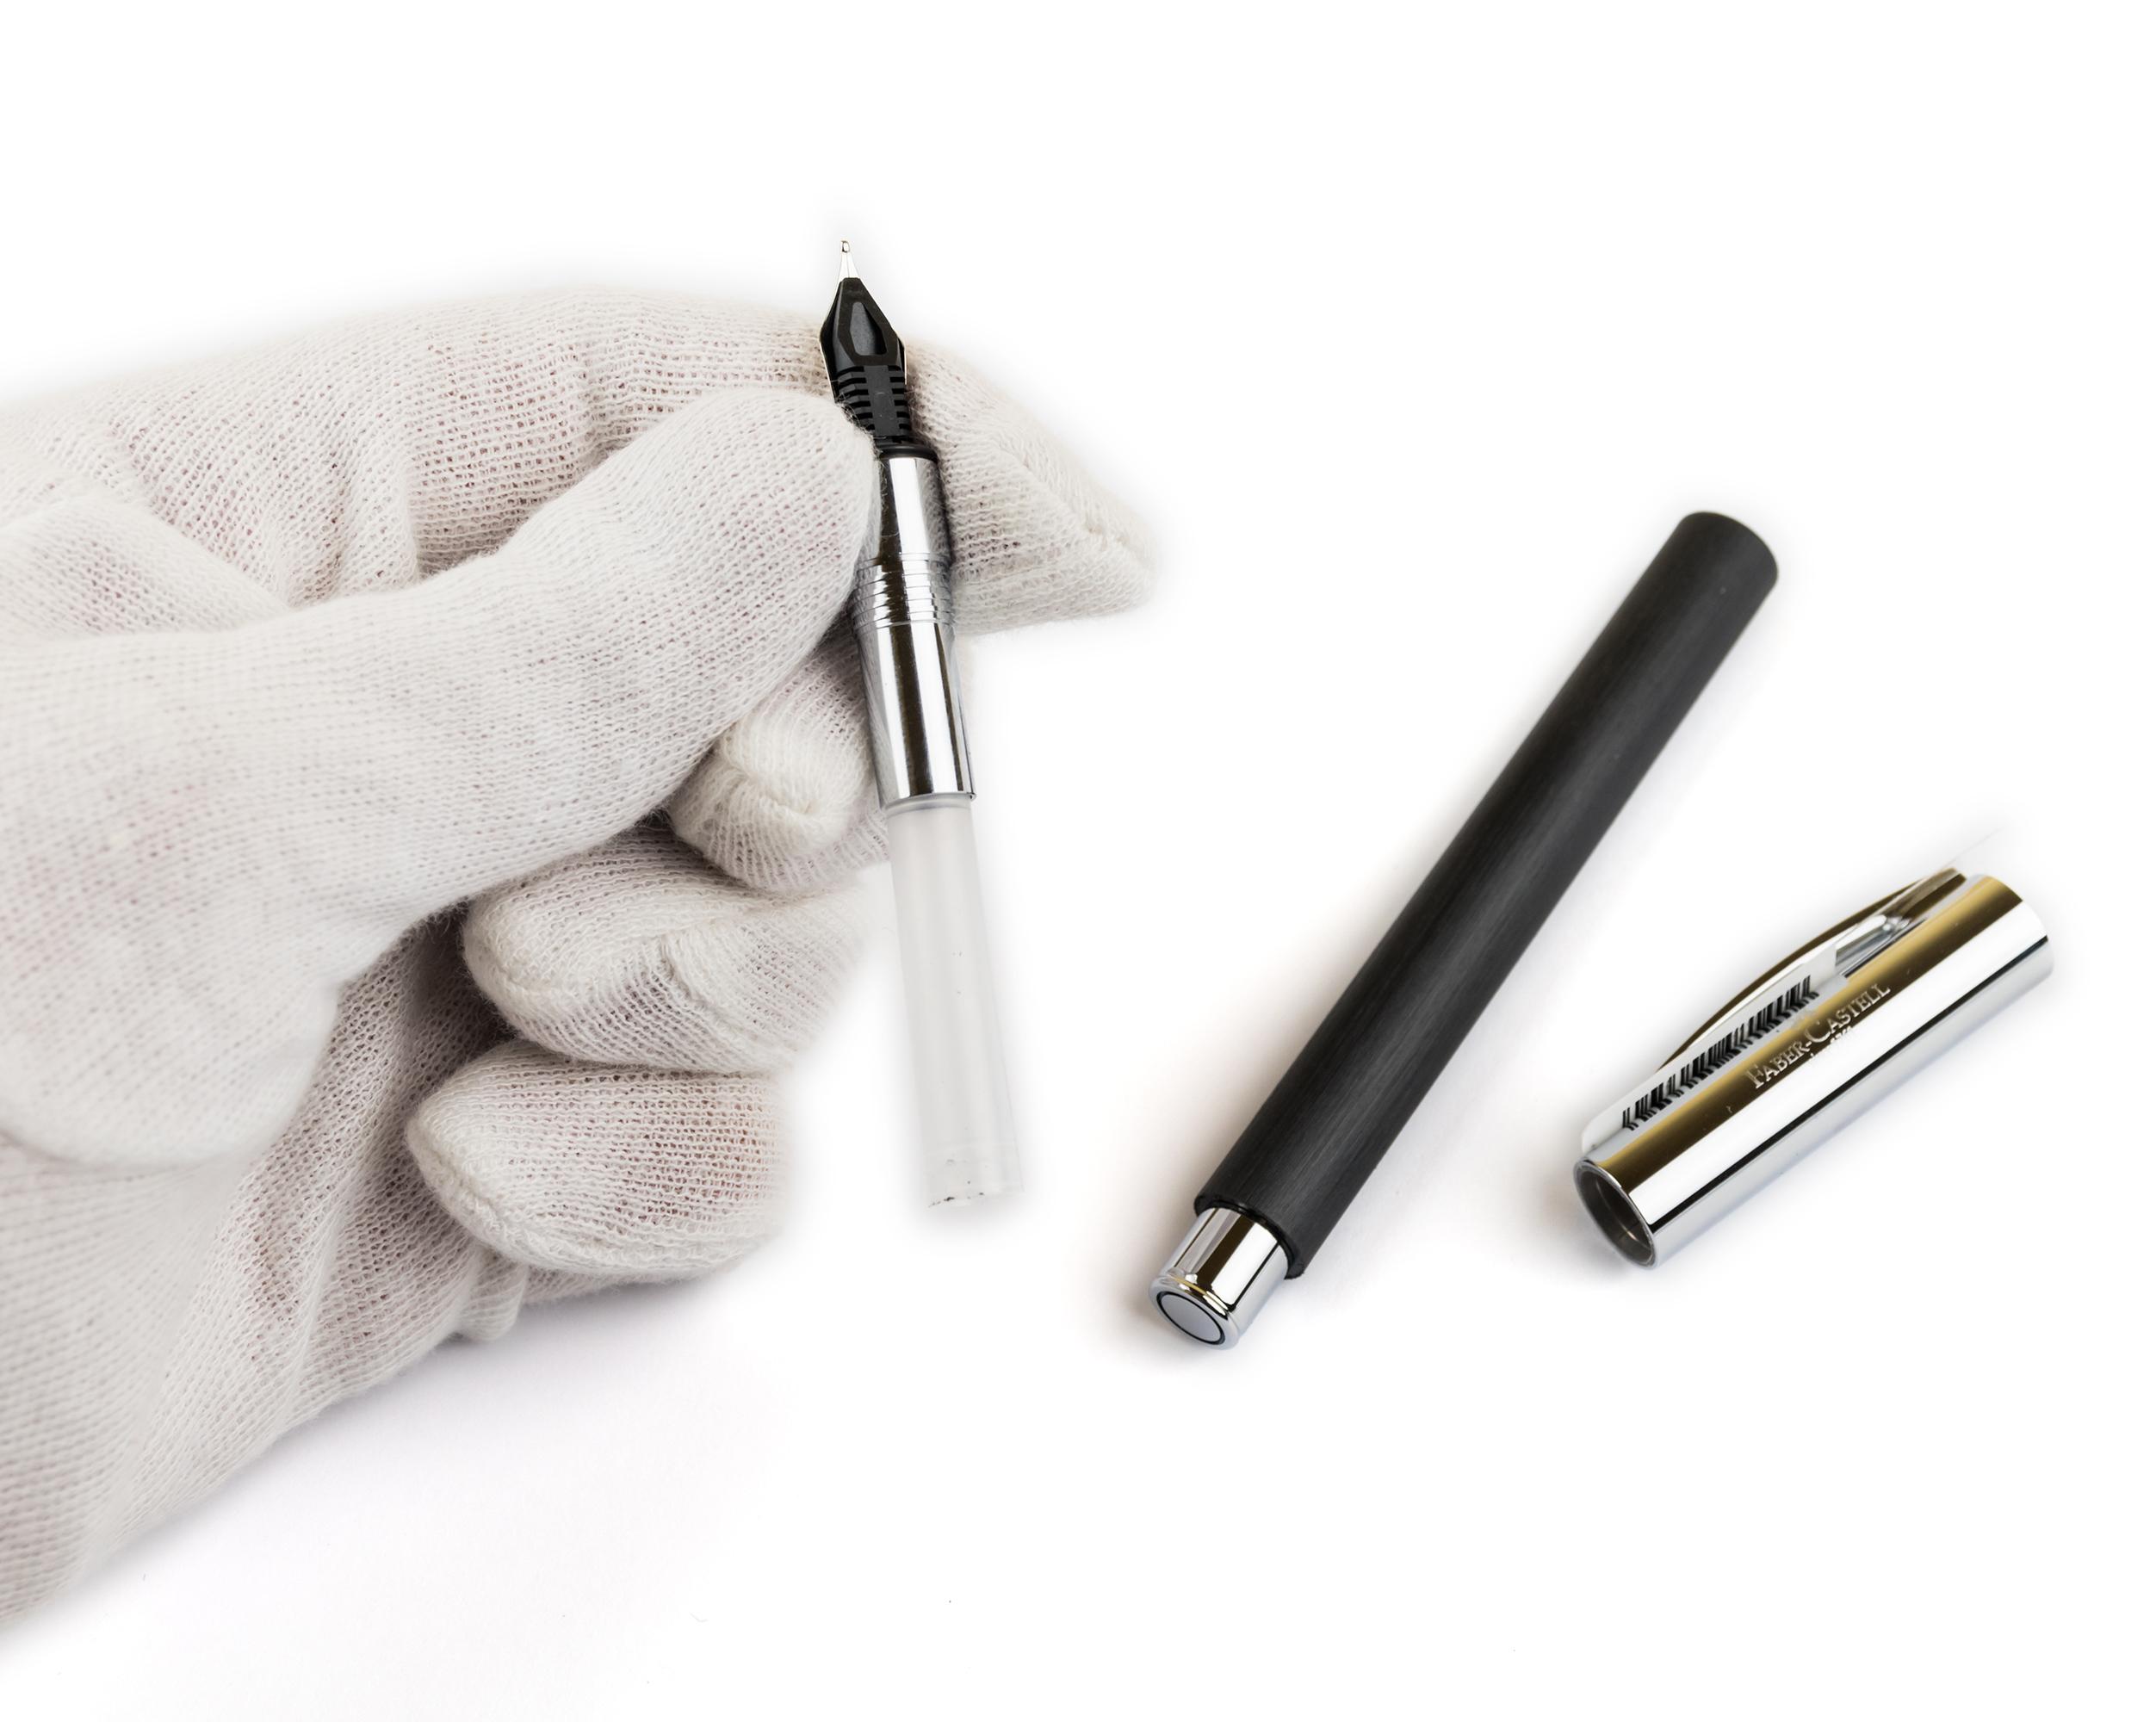 Faber Castell Ambition Black M Fountain Pen Scribemarket